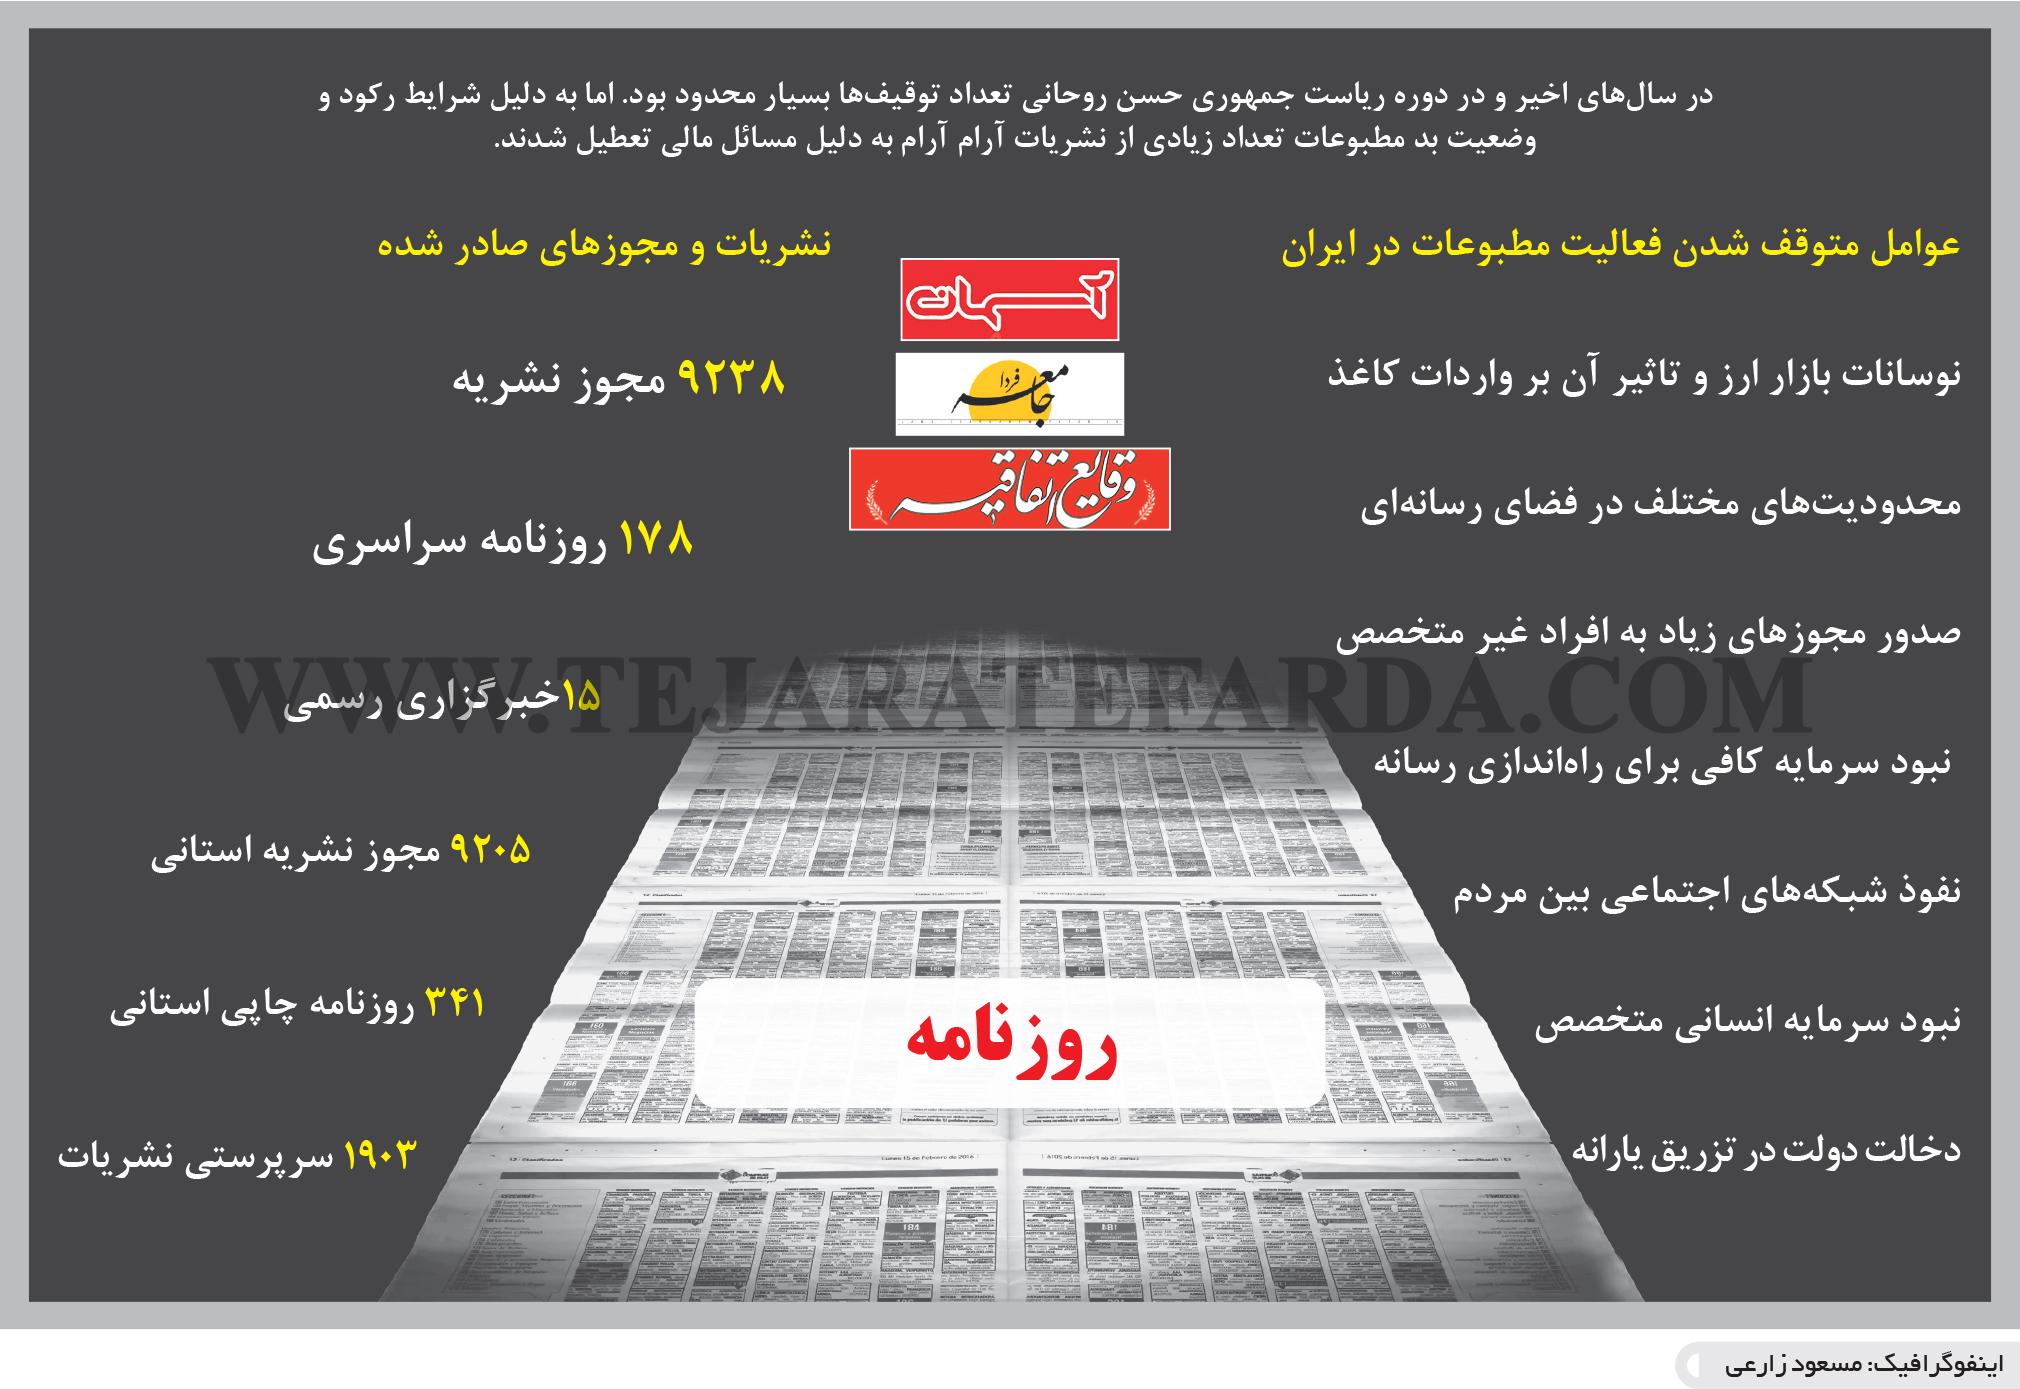 تجارت- فردا- تعطیلی مطبوعات(اینفوگرافیک)